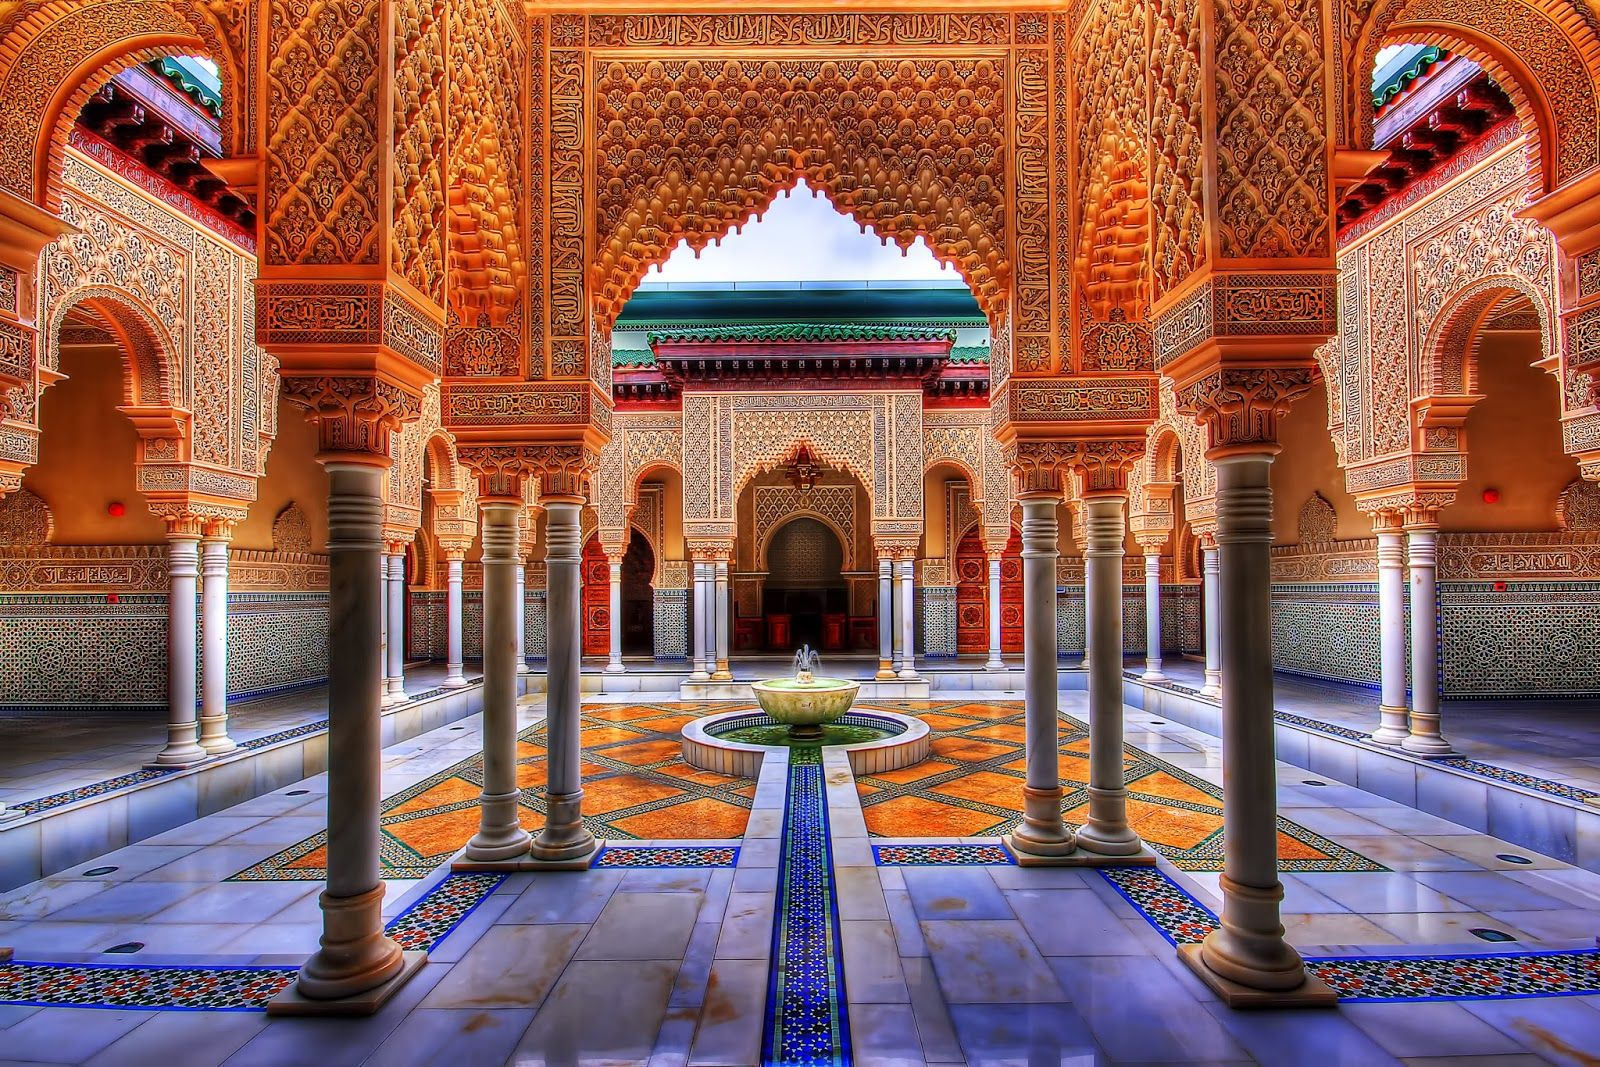 """Art and Relics"" - Moroccan Palace, Putrajaya, Malaysia - MOHD SHAMSURI OSMAN - mohd.shamsuri@bdpint.com.jpg"